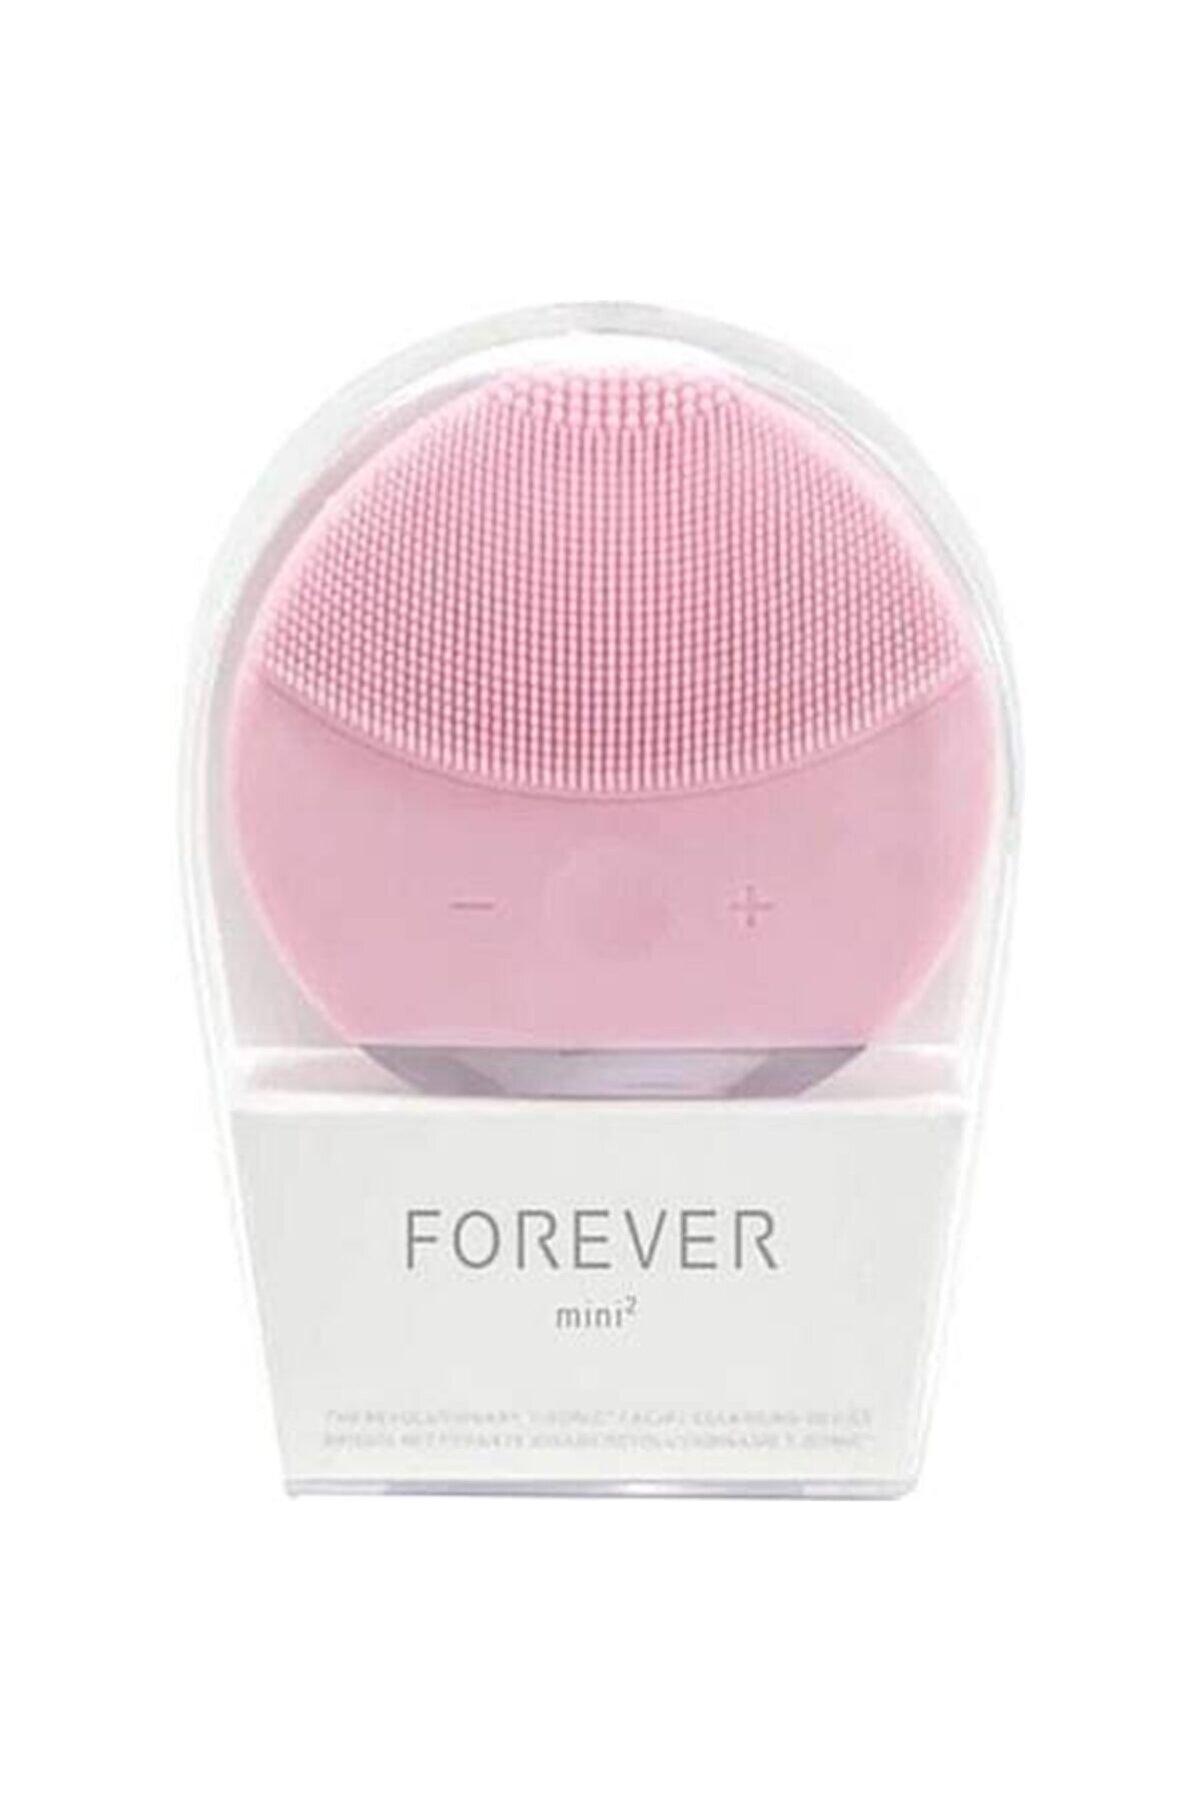 Forever Lina Mini 2 Pearlpink Cilt Temizleme Cihazı